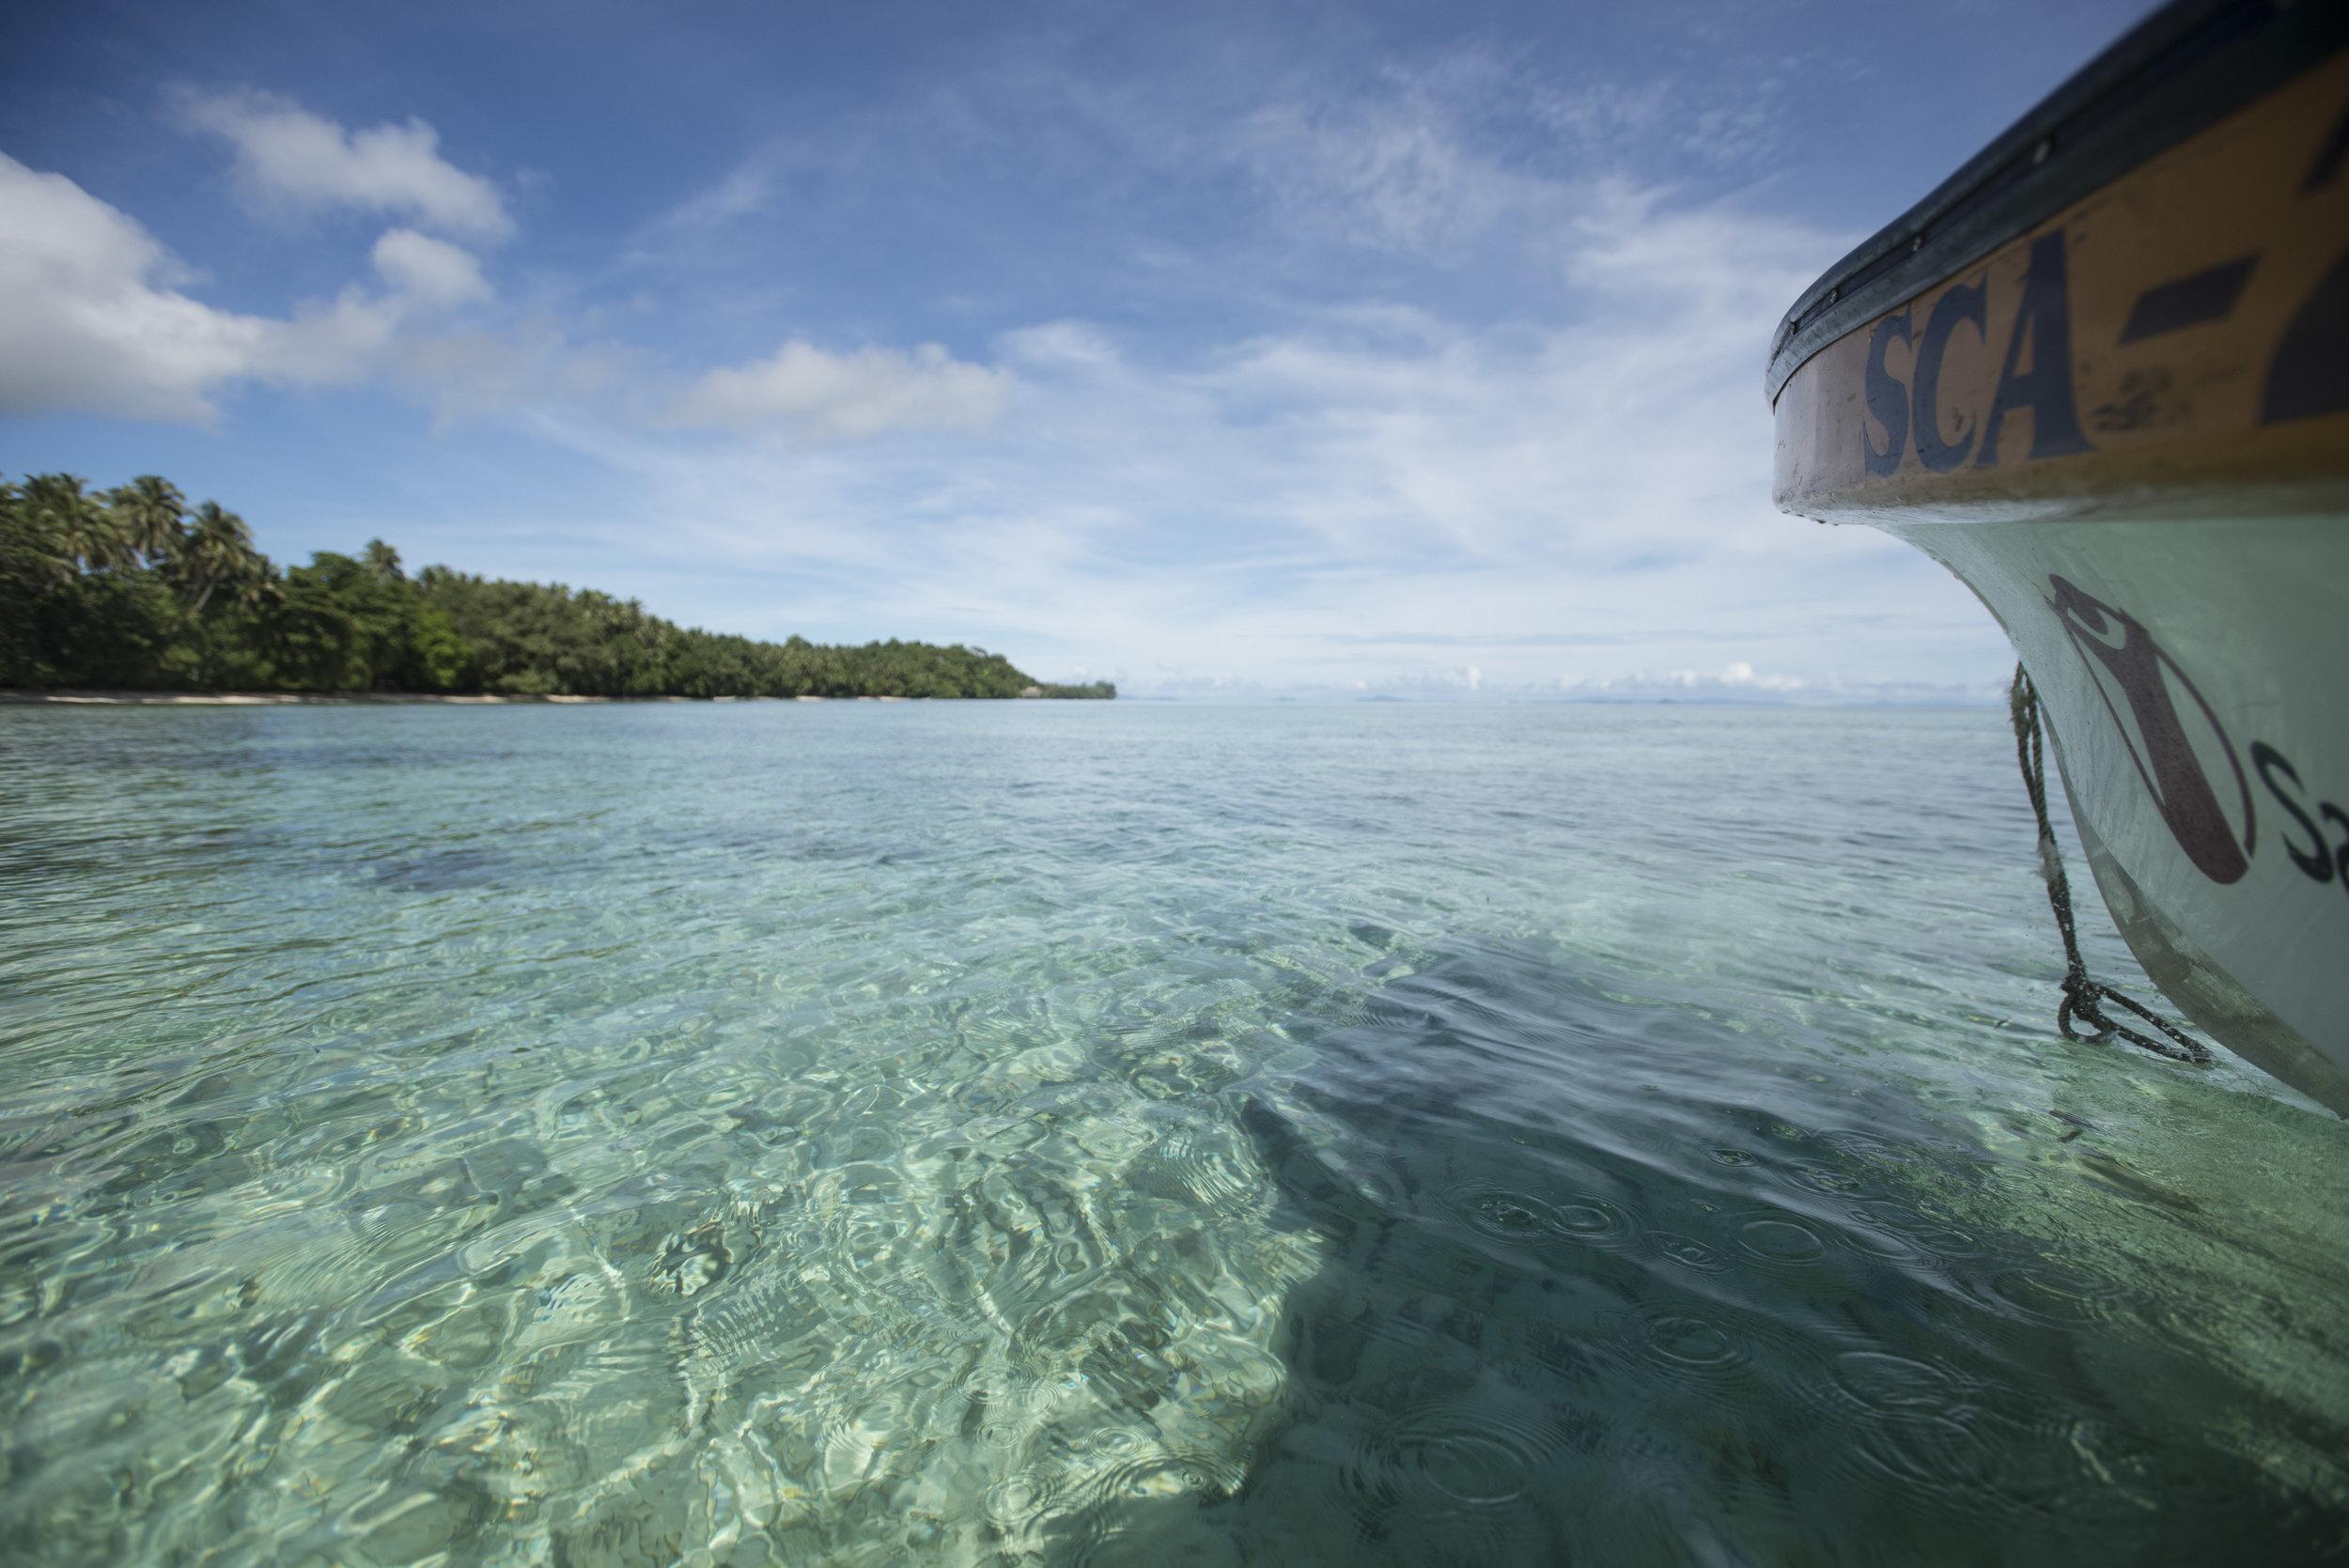 Choisuel Province. Solomon Islands. 2016.